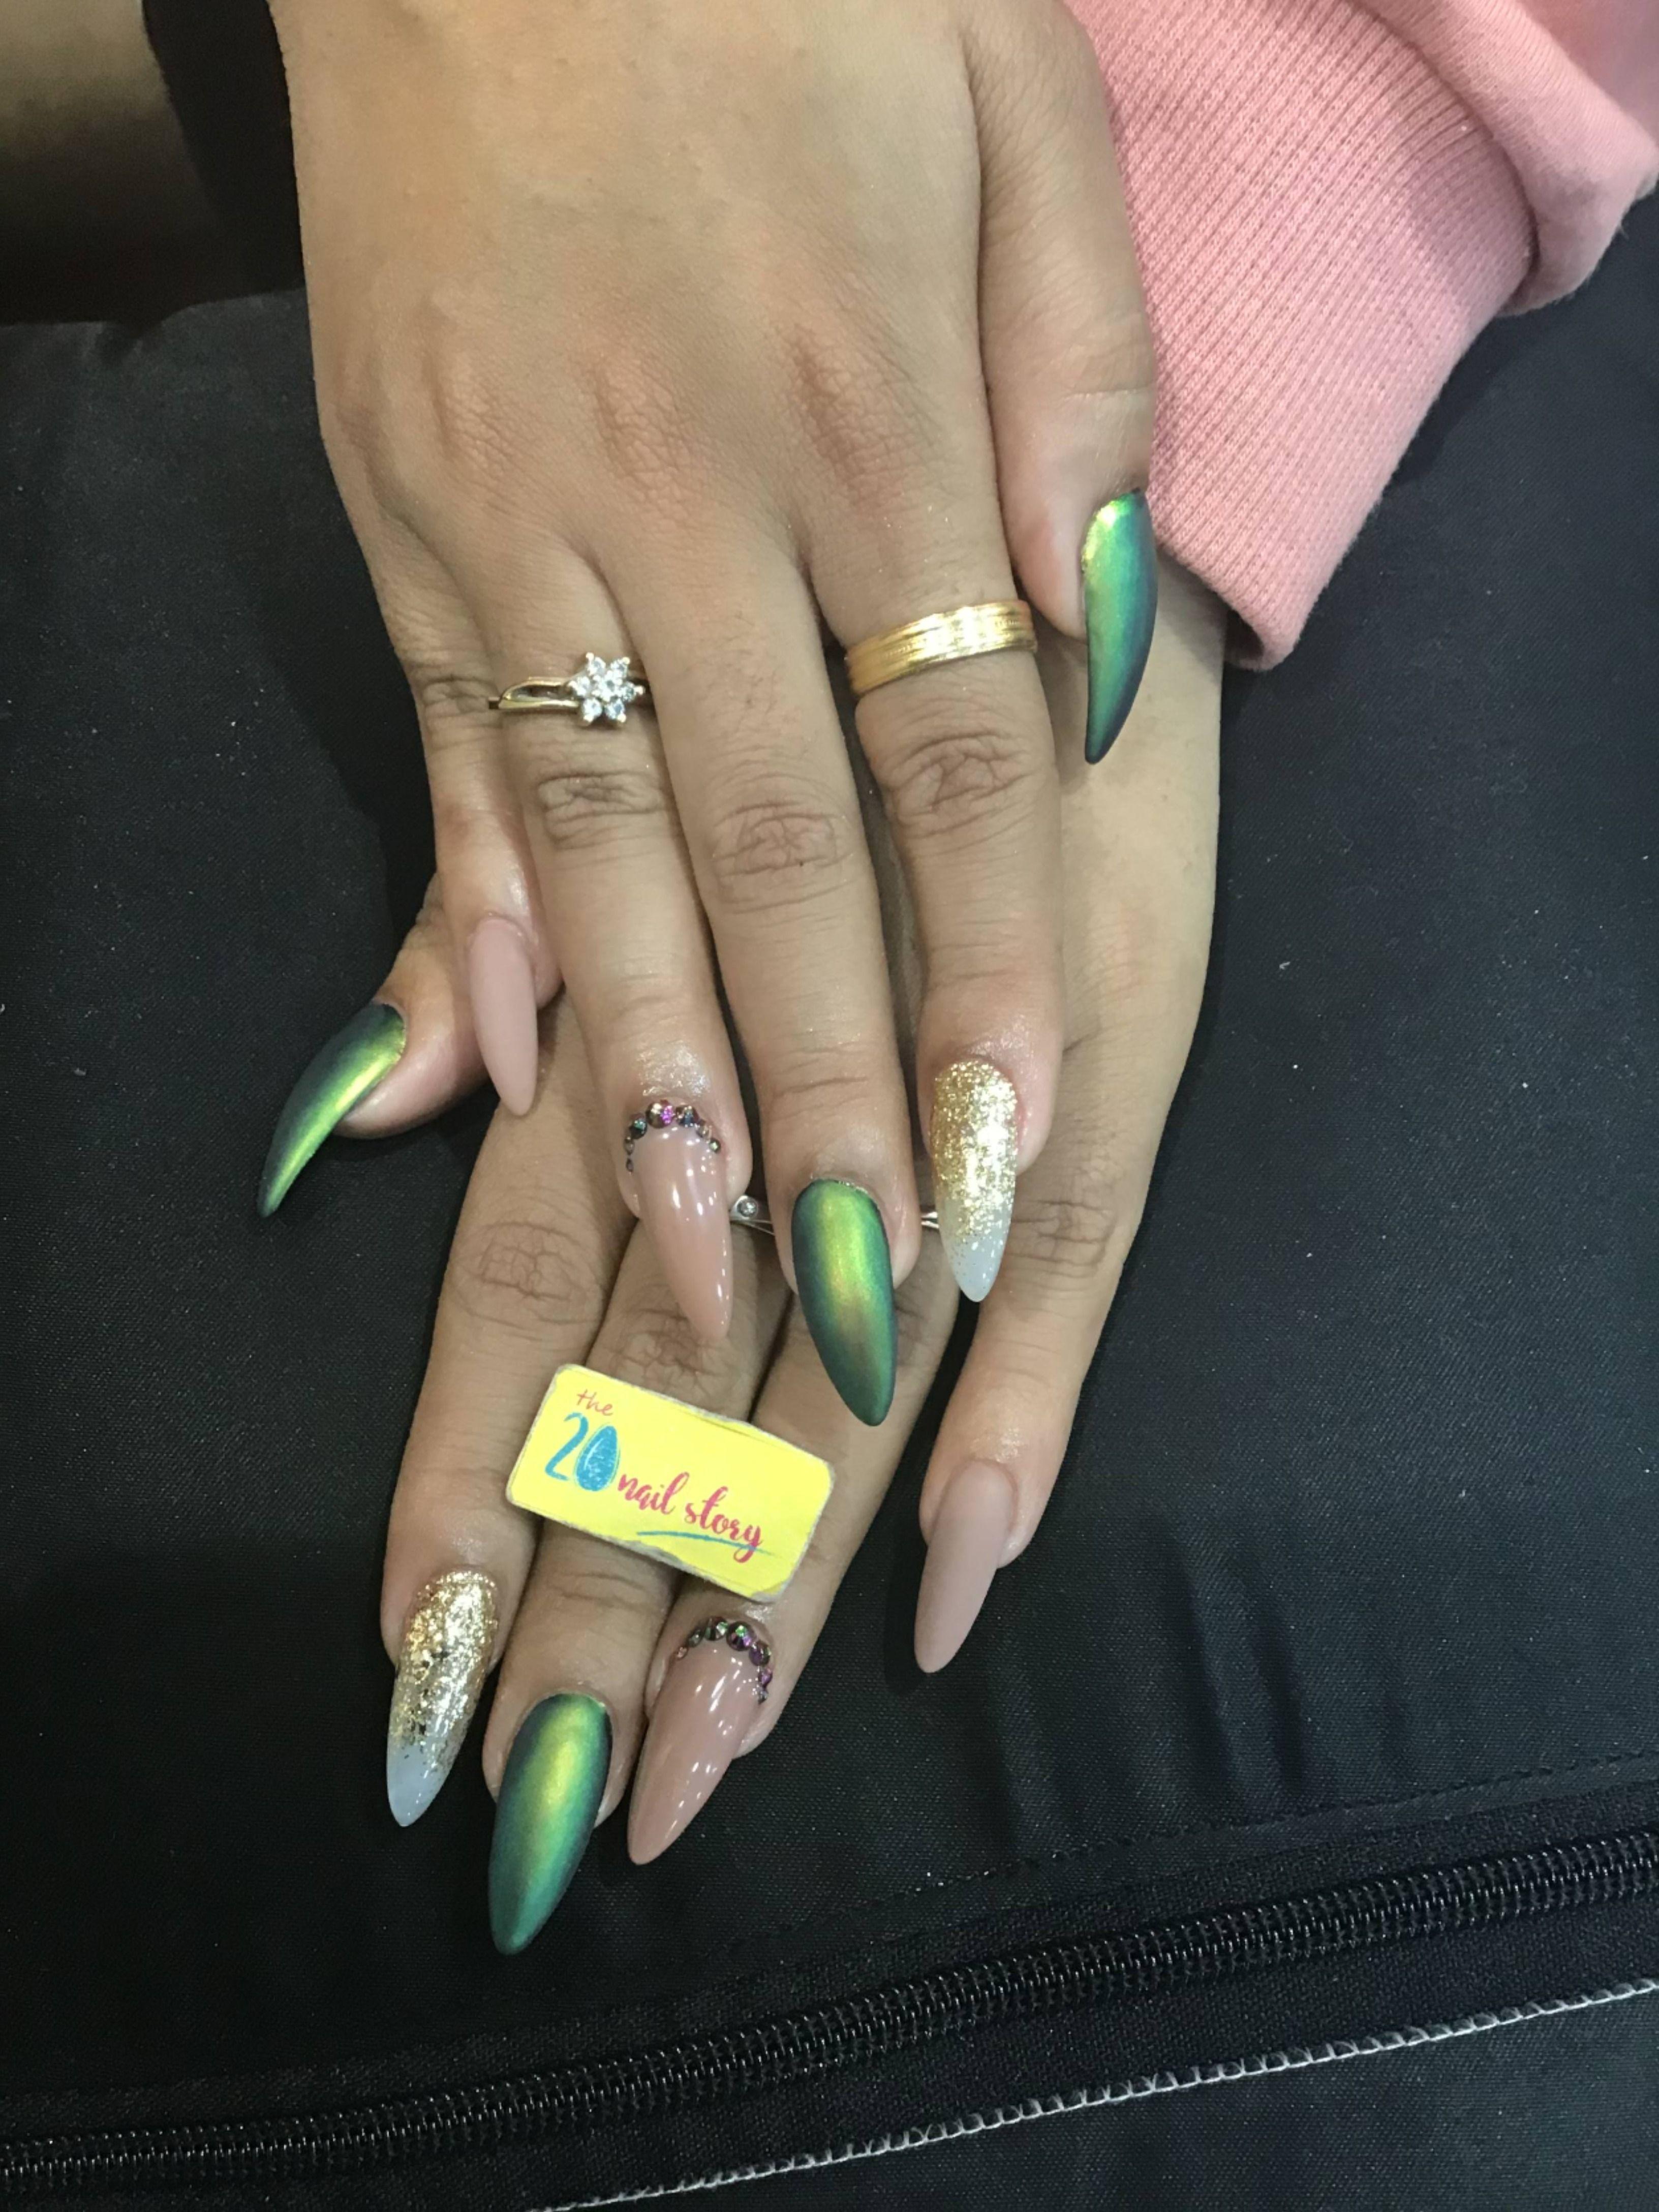 Nail Art Salon Near Me In 2020 Best Nail Salon Nail Art Salon Nail Extensions